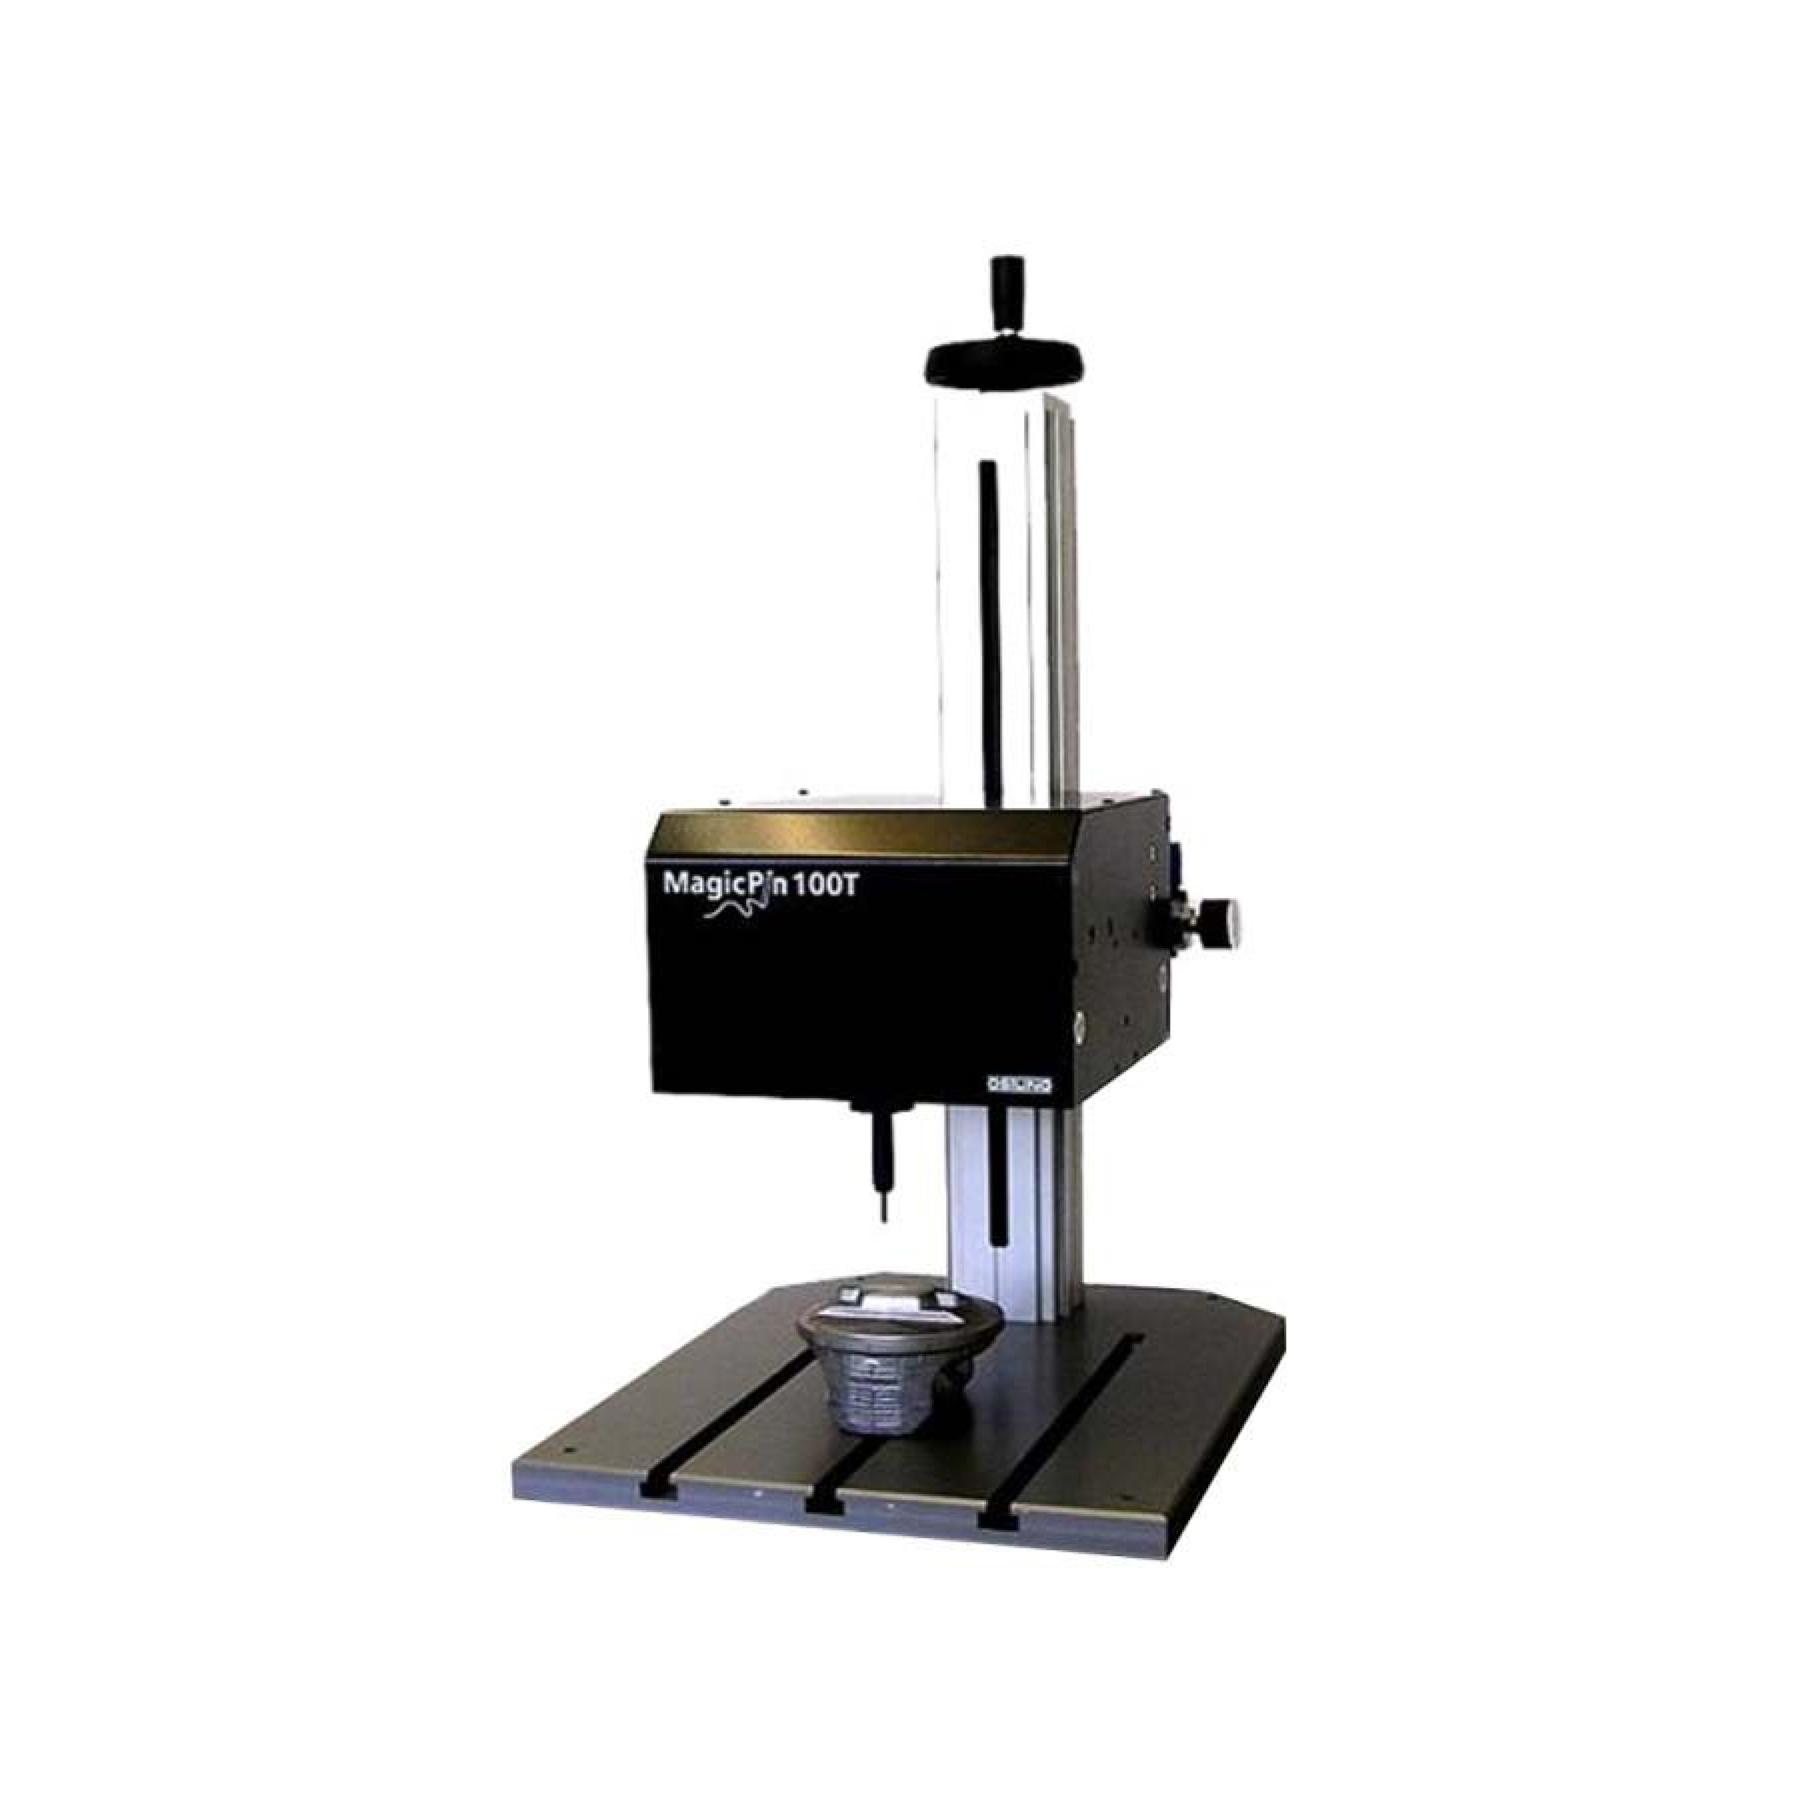 MAGICPIN-100T Pin Marking Machine